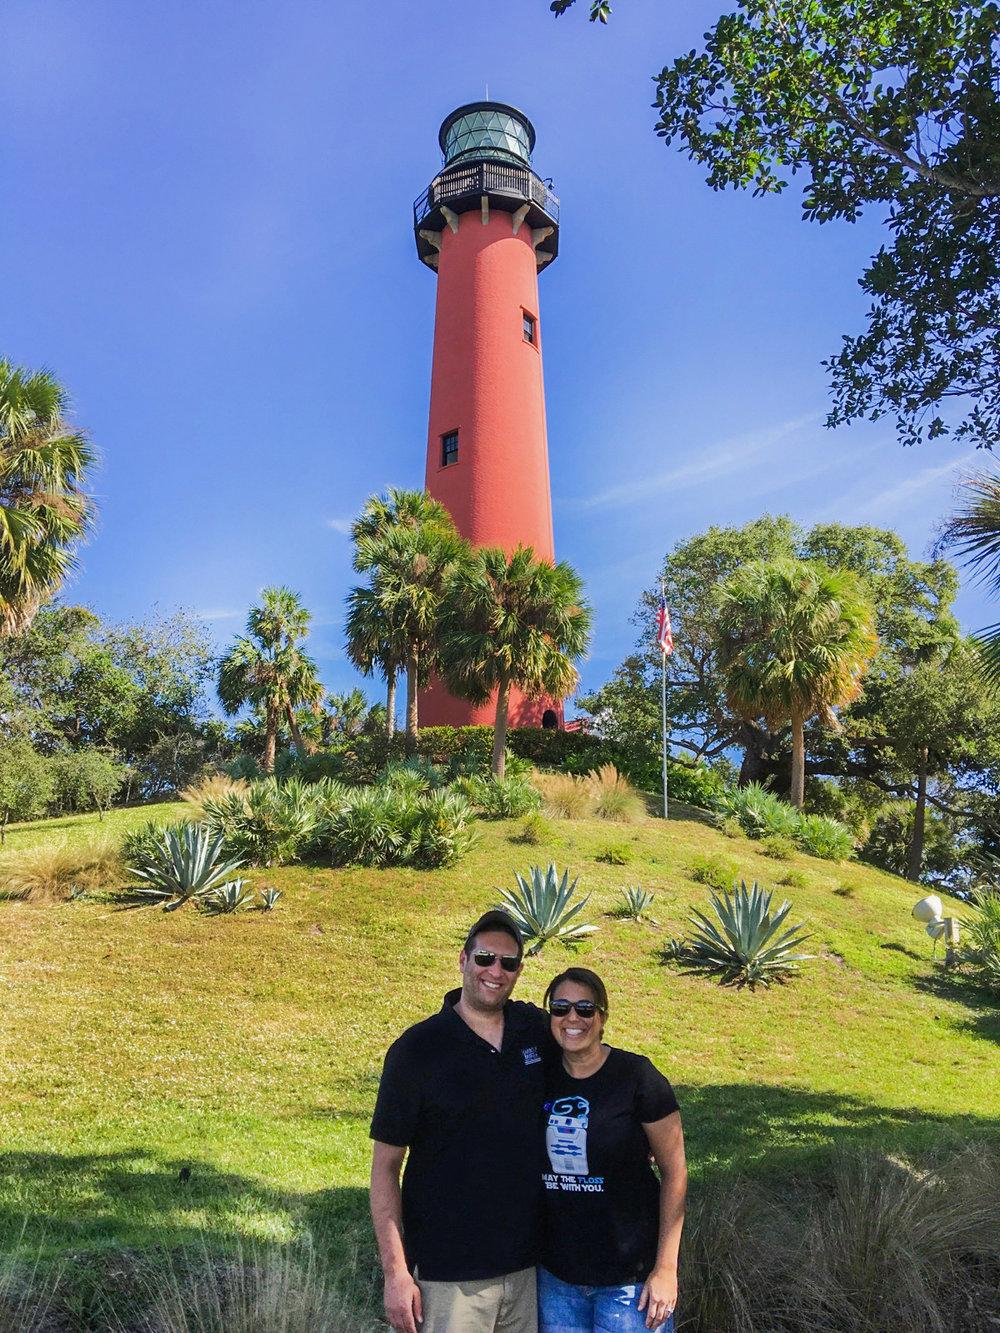 dr kubiliun wife jessica jupiter lighthouse.jpg